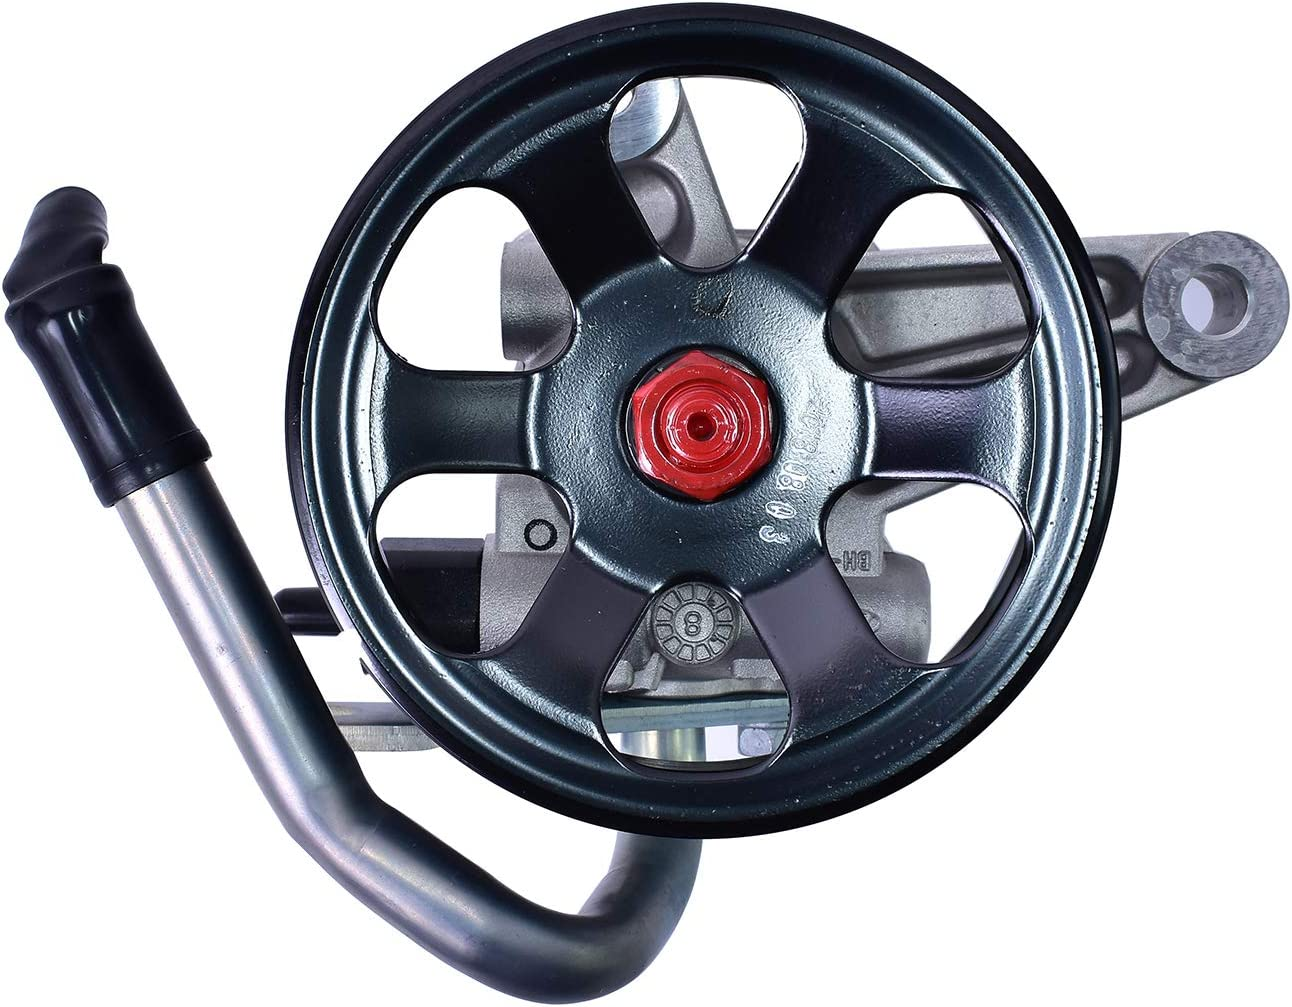 New Mando 20A1148 Power Steering Pump Original Equipment